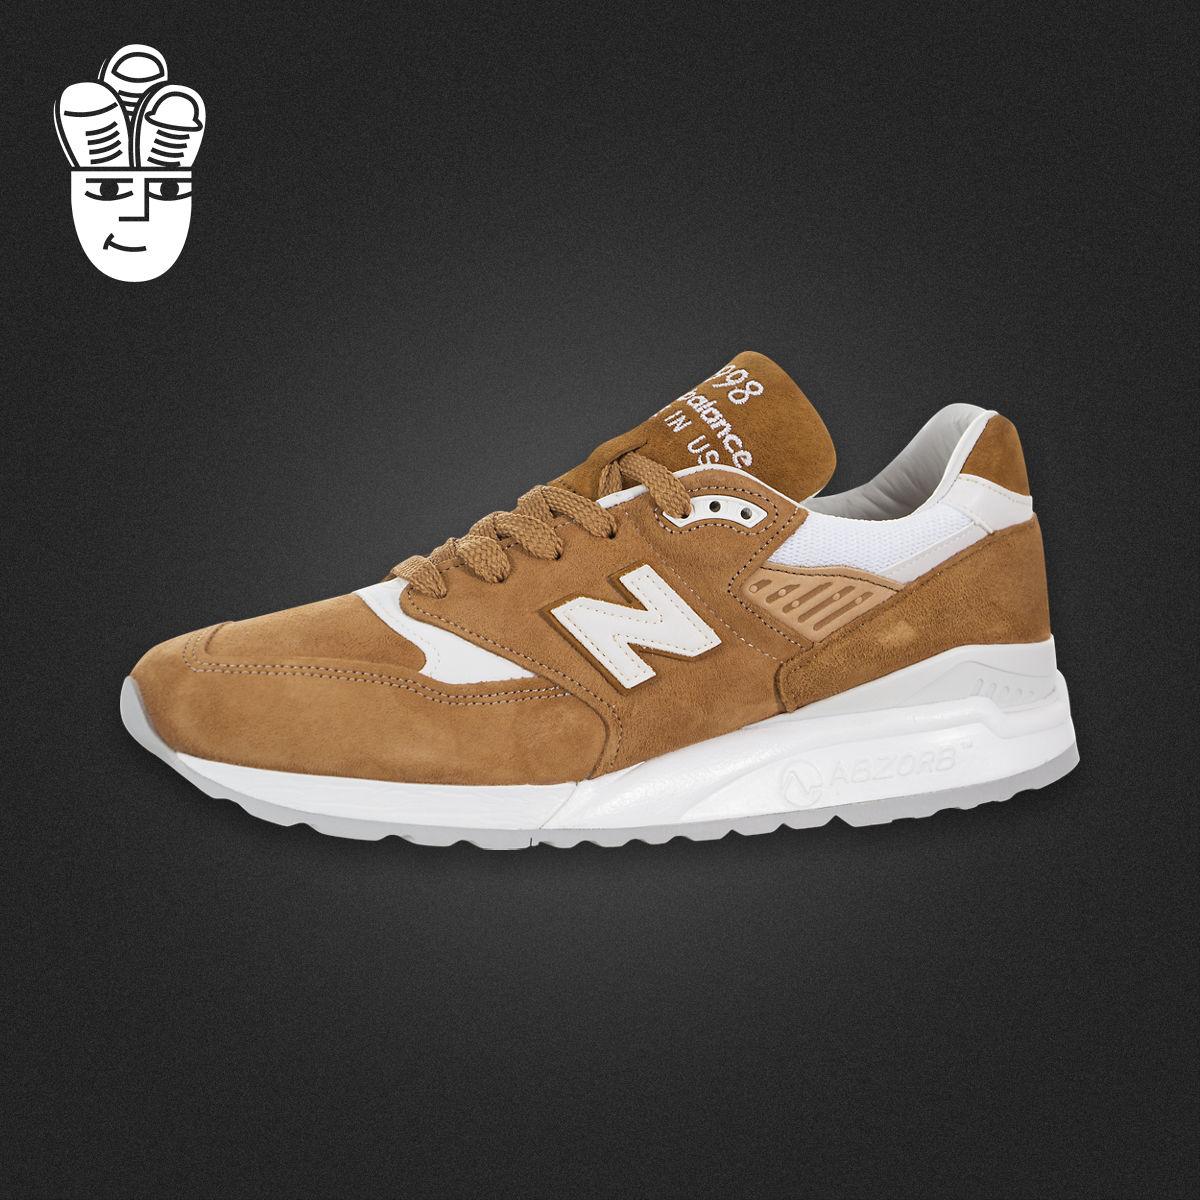 New Balance 998 NB美产男鞋 经典复古跑步鞋 慢跑鞋 运动休闲鞋